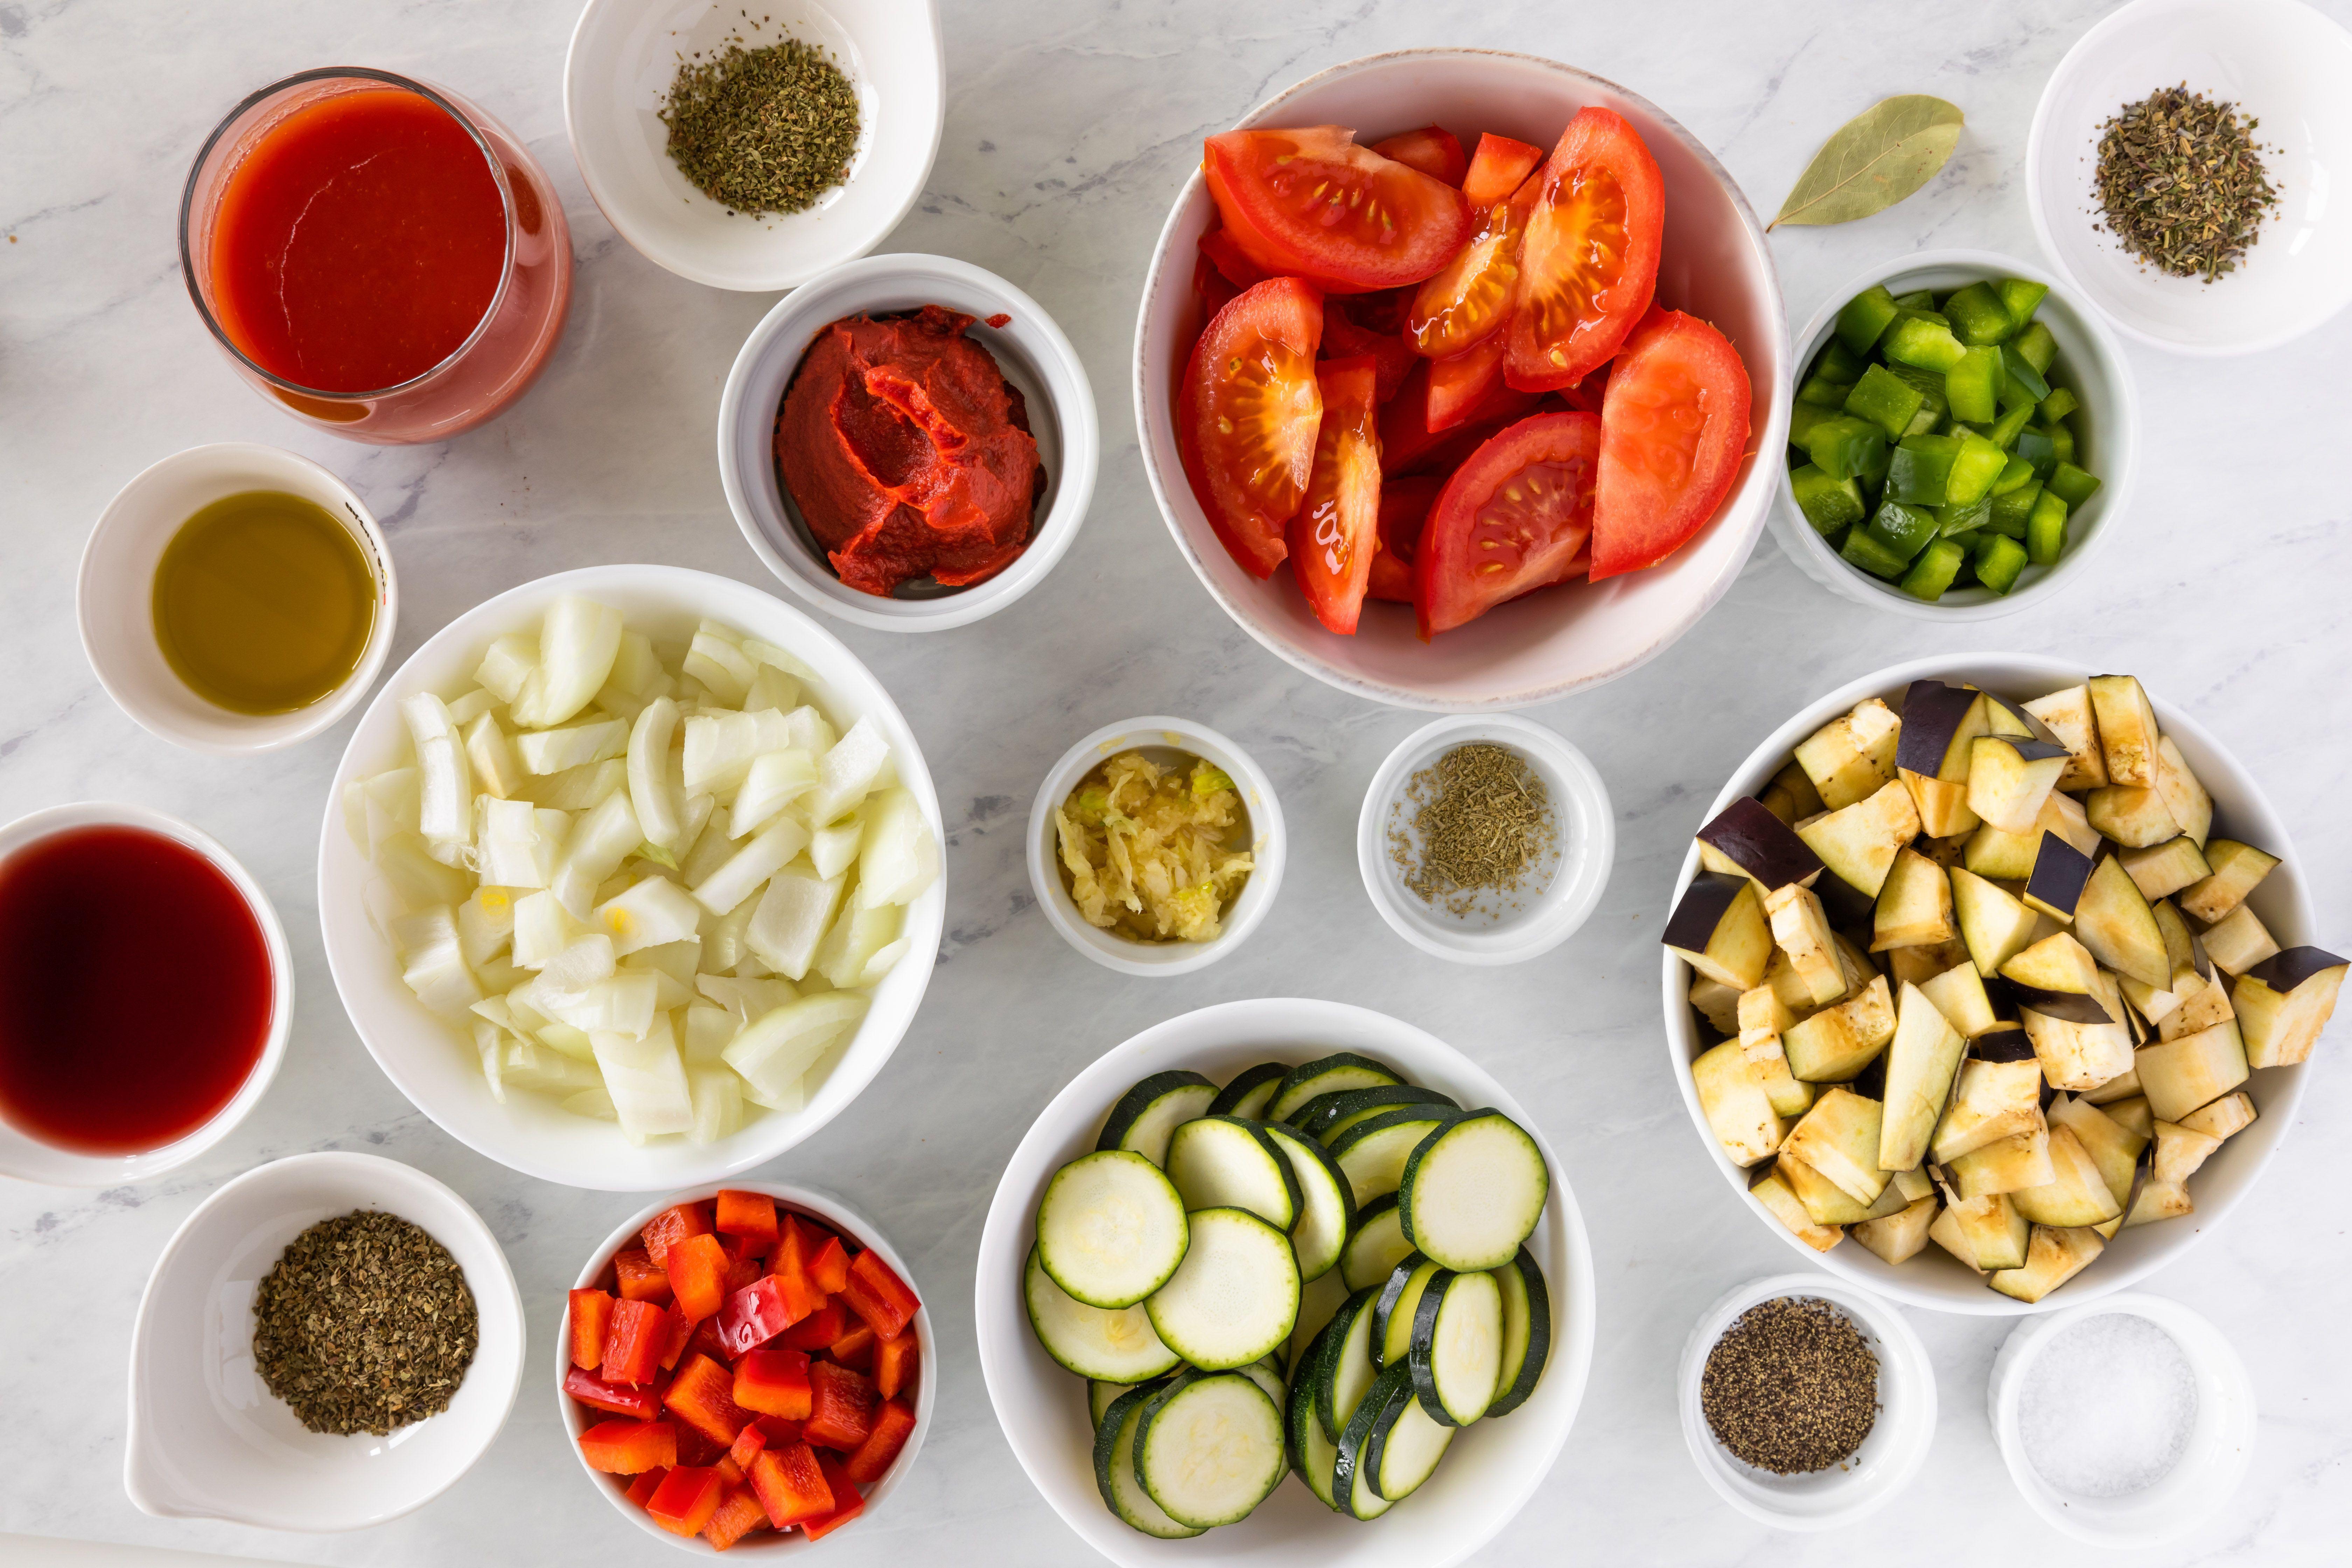 Ingredients for vegan ratatouille